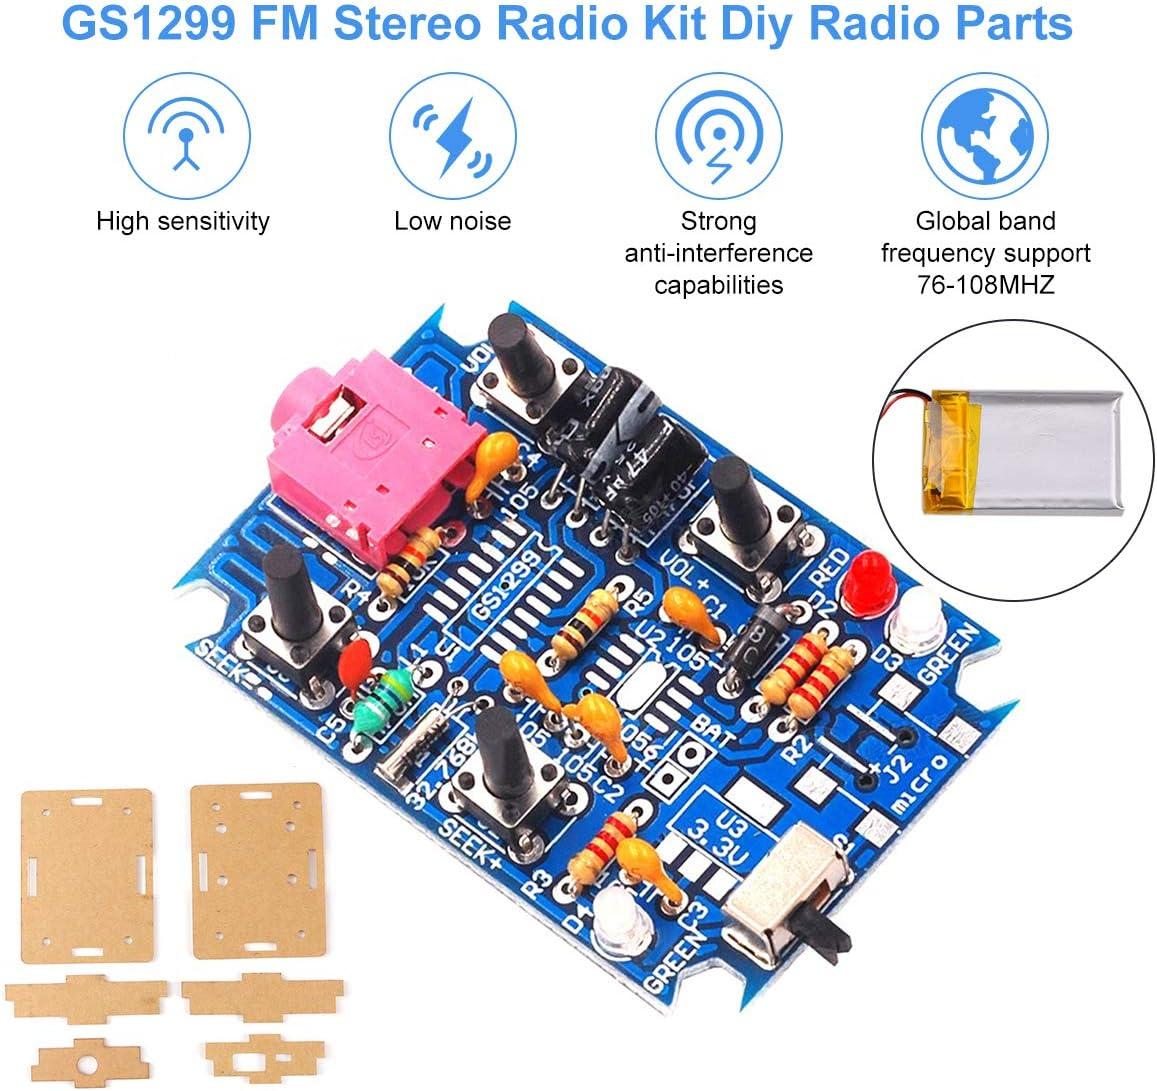 Fm Radio Modul Fm Stereo Radio Kit Diy Radio Parts Gs1299 3 7 V 4 2 V Mit 250 Mah Akku Digital Production Diy Radio Parts Support 76 108 Mhz Frequenz Radio Set Diy Mit